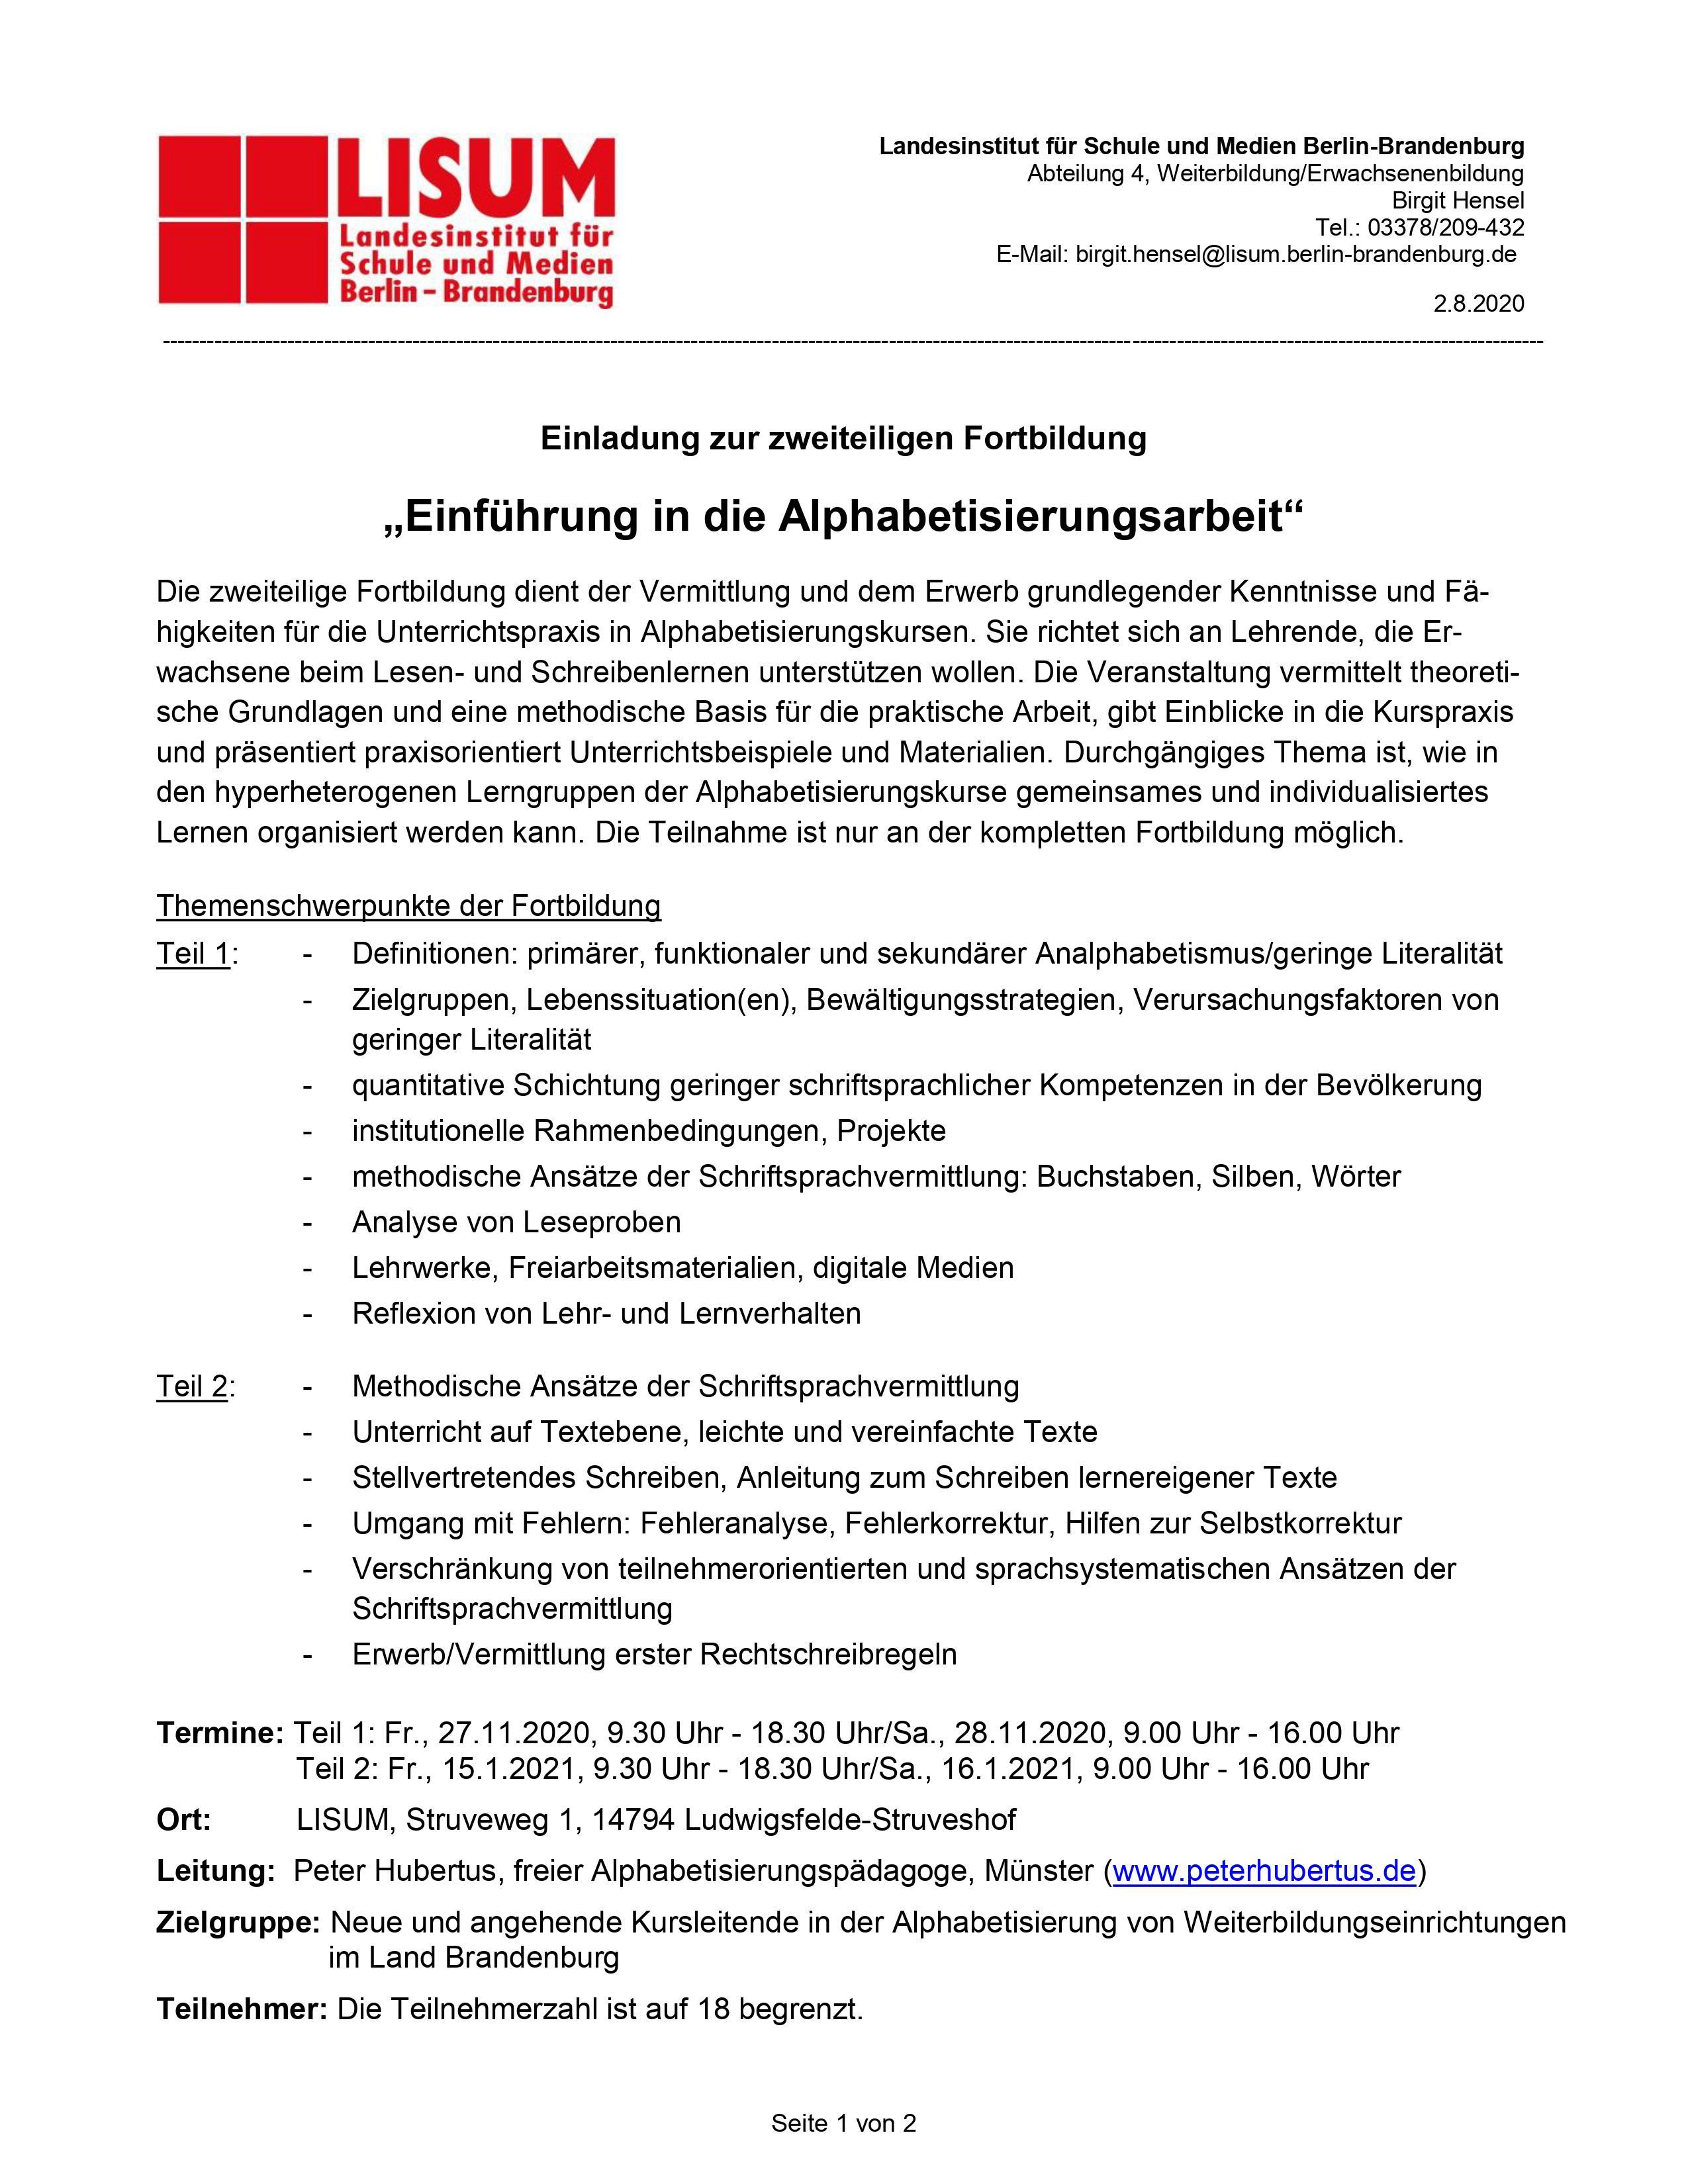 scr_Einführung Peter Hubertus